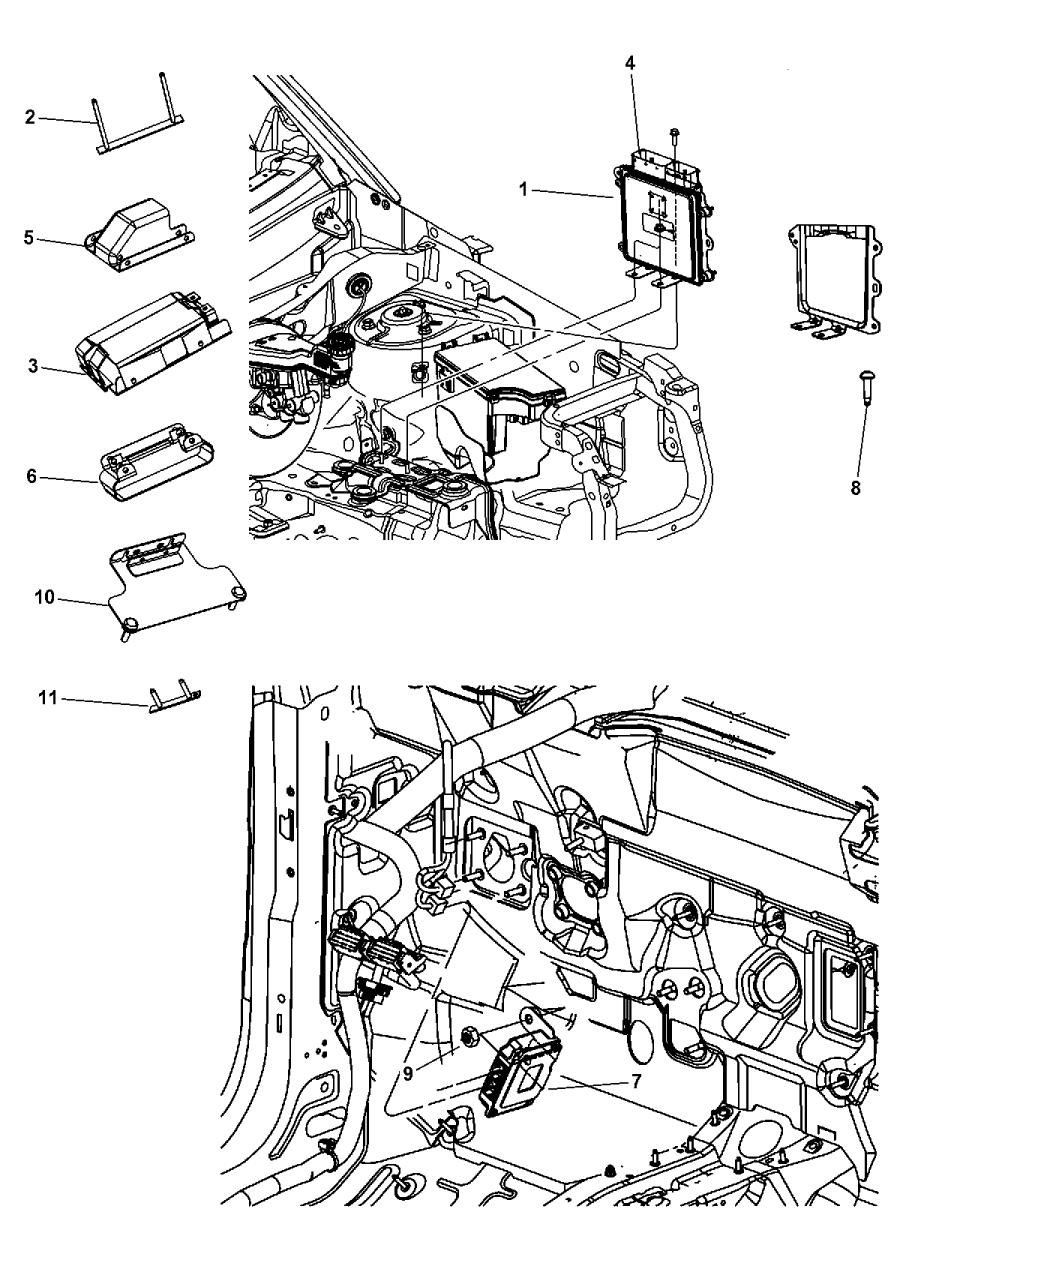 2012 Jeep Compass Engine Diagram - E5 wiring diagramKUBB-AUF.DE